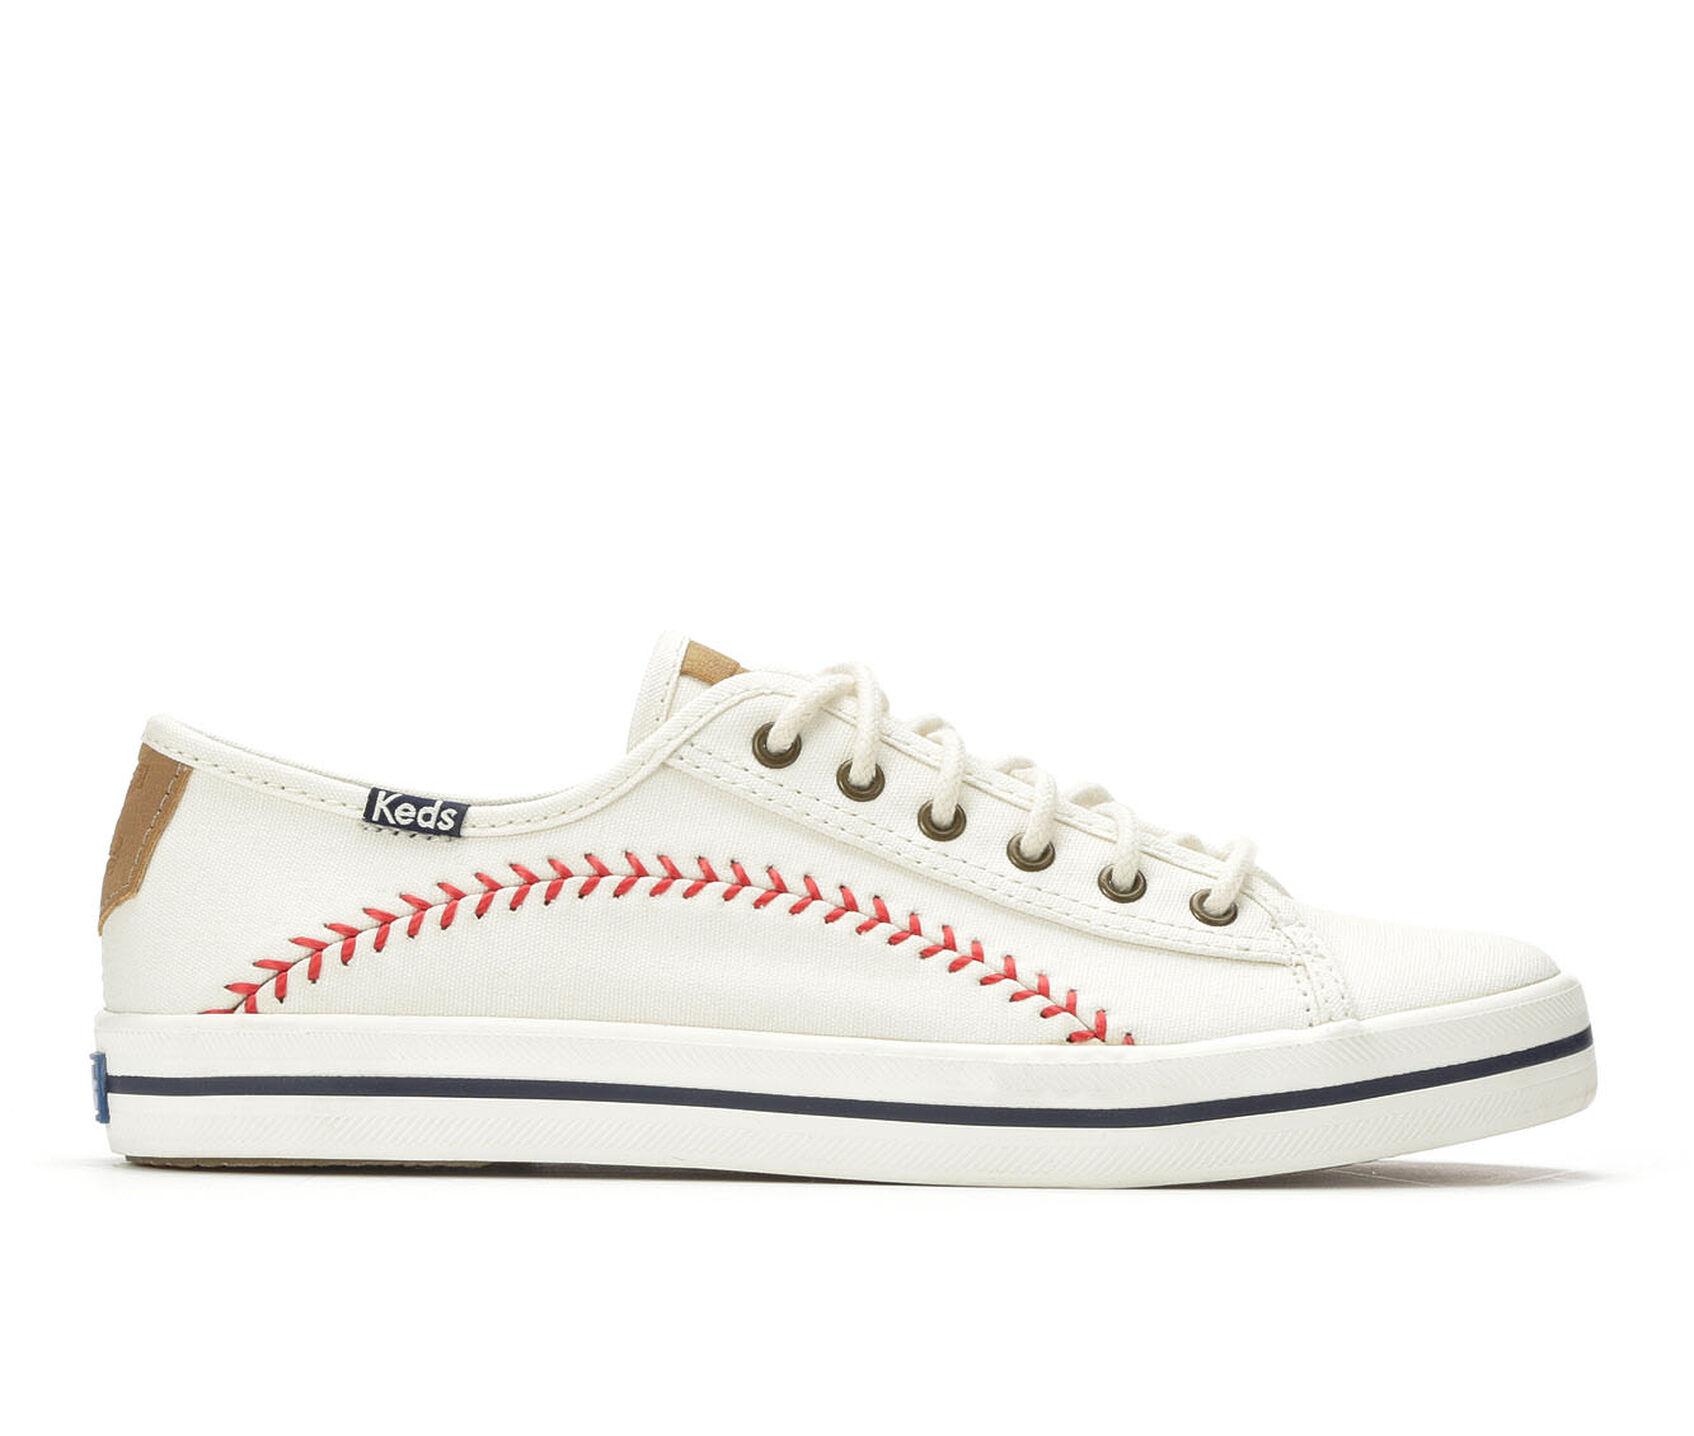 1f4a709f242925 Women s Keds Kickstart Pennant Baseball-Inspired Sneakers